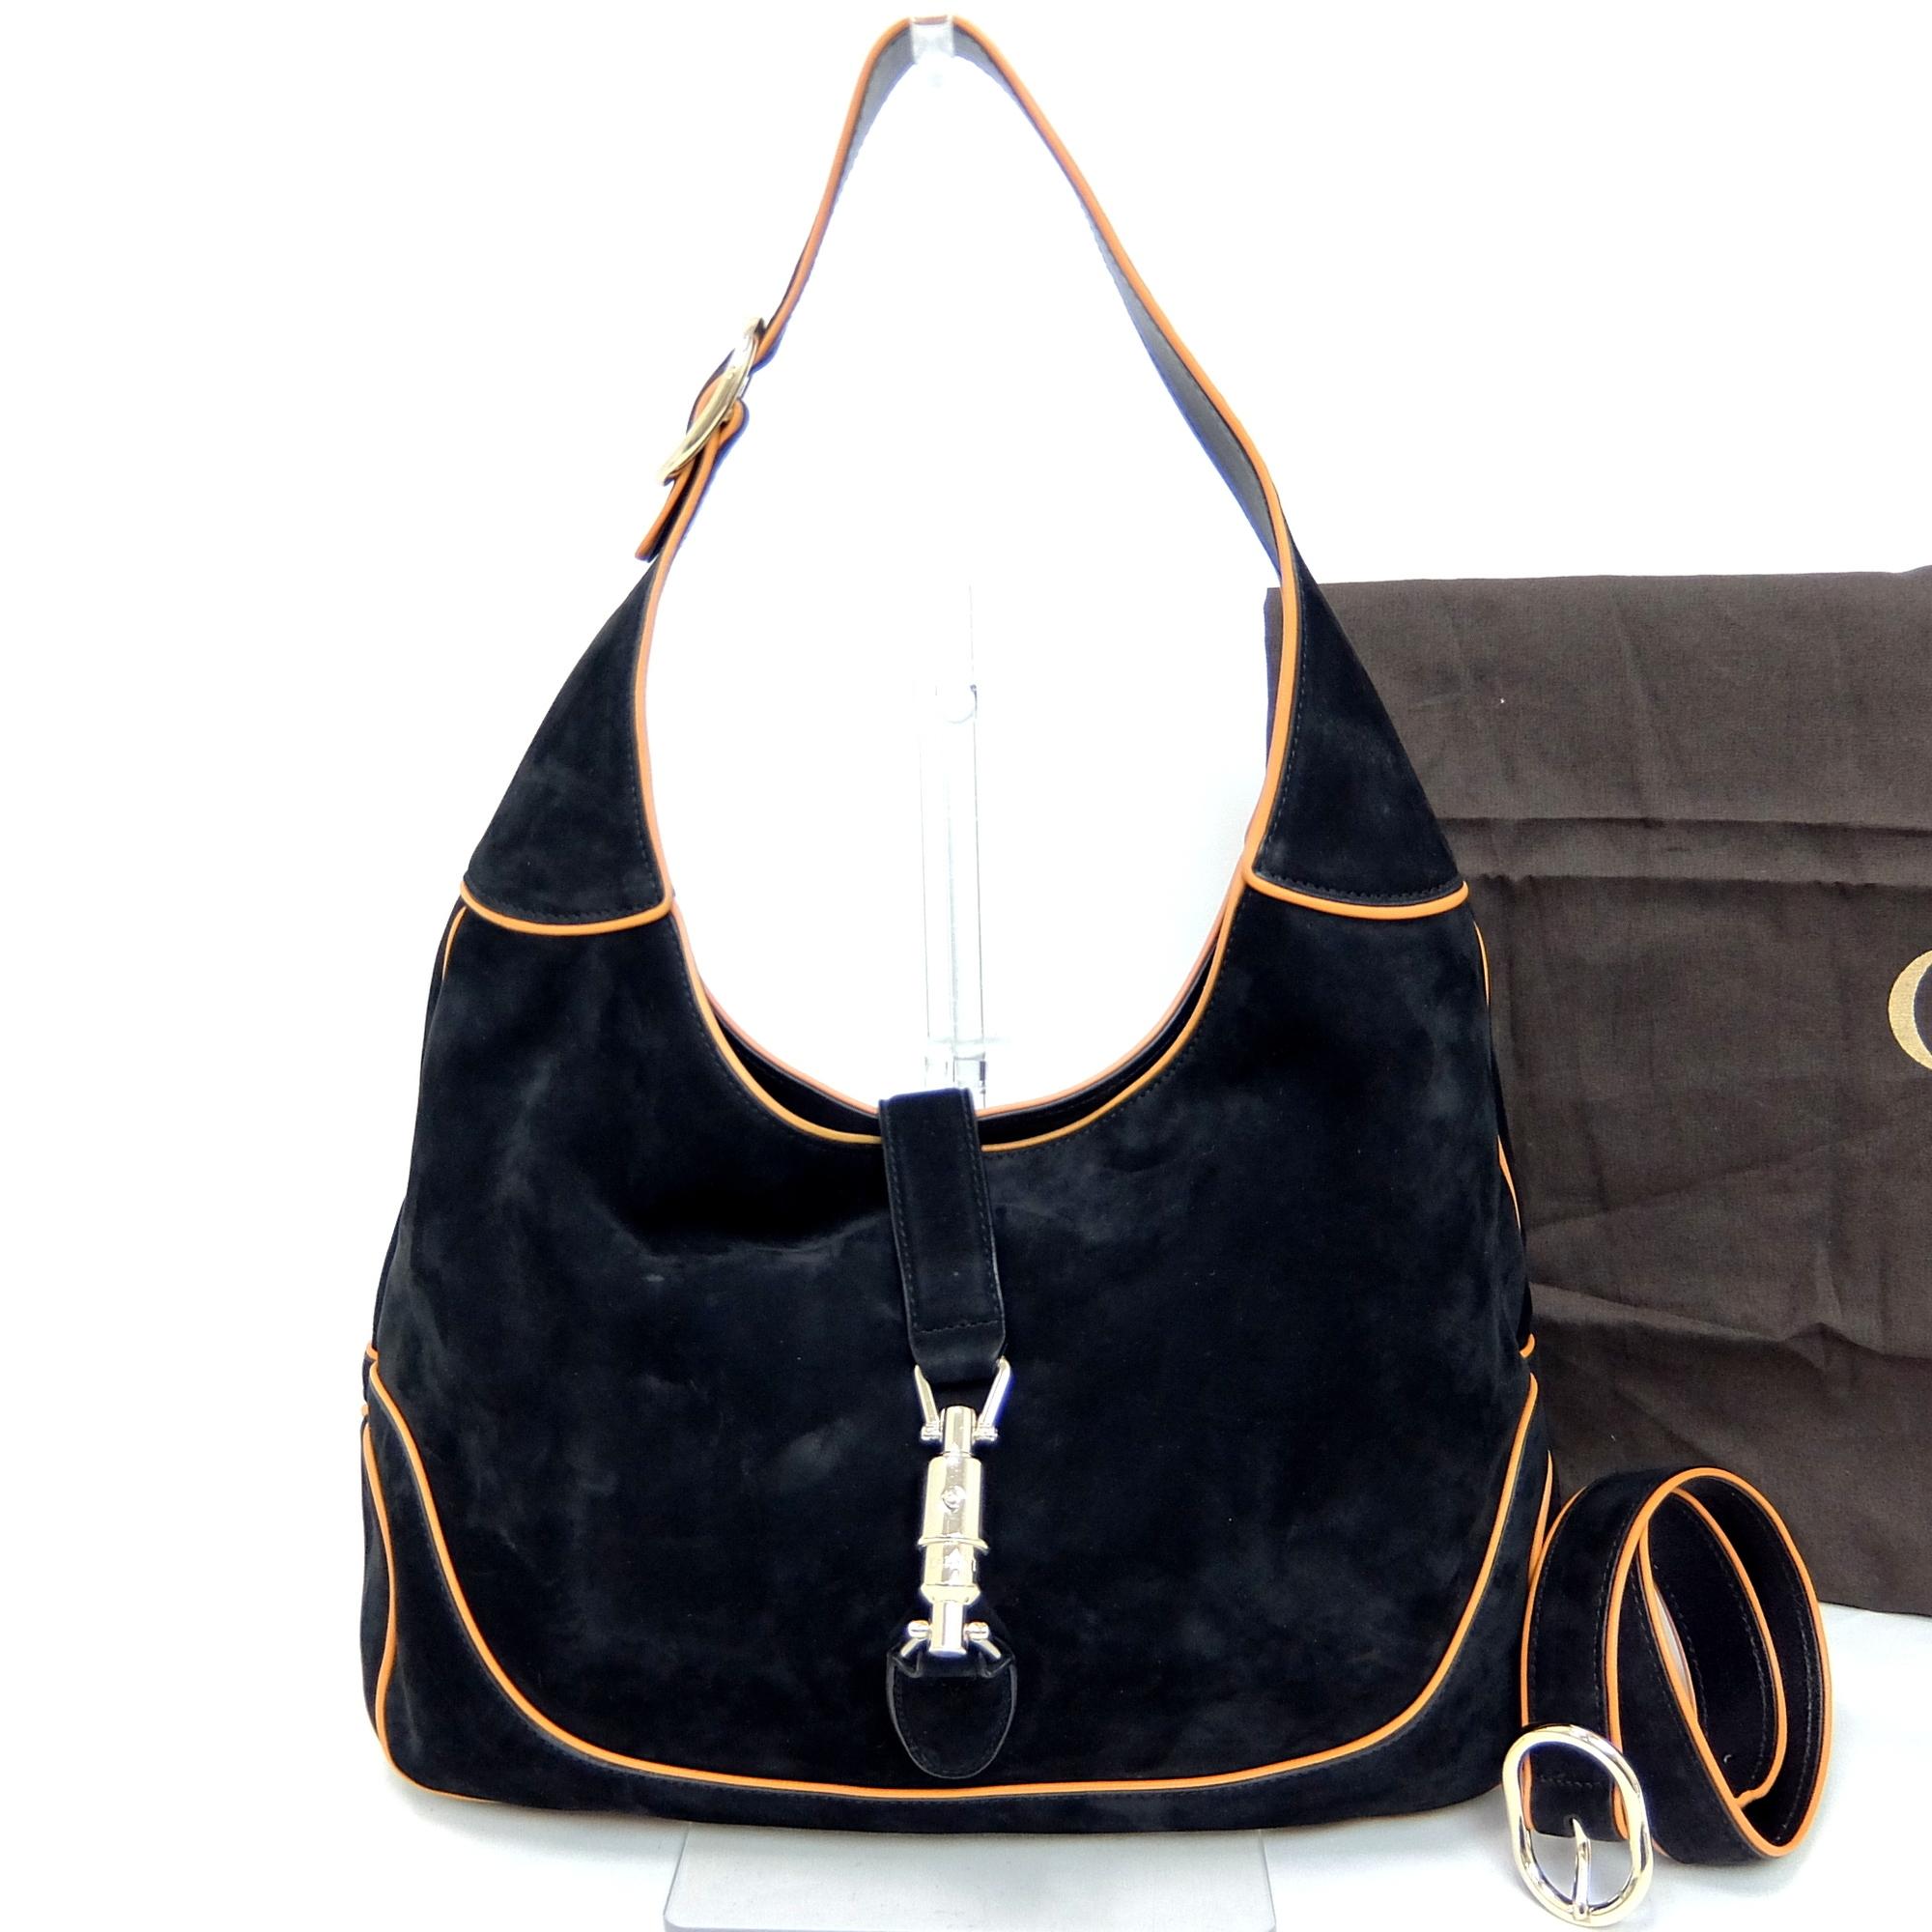 4c2e47e7427 Auth Gucci Jackie Women s Leather